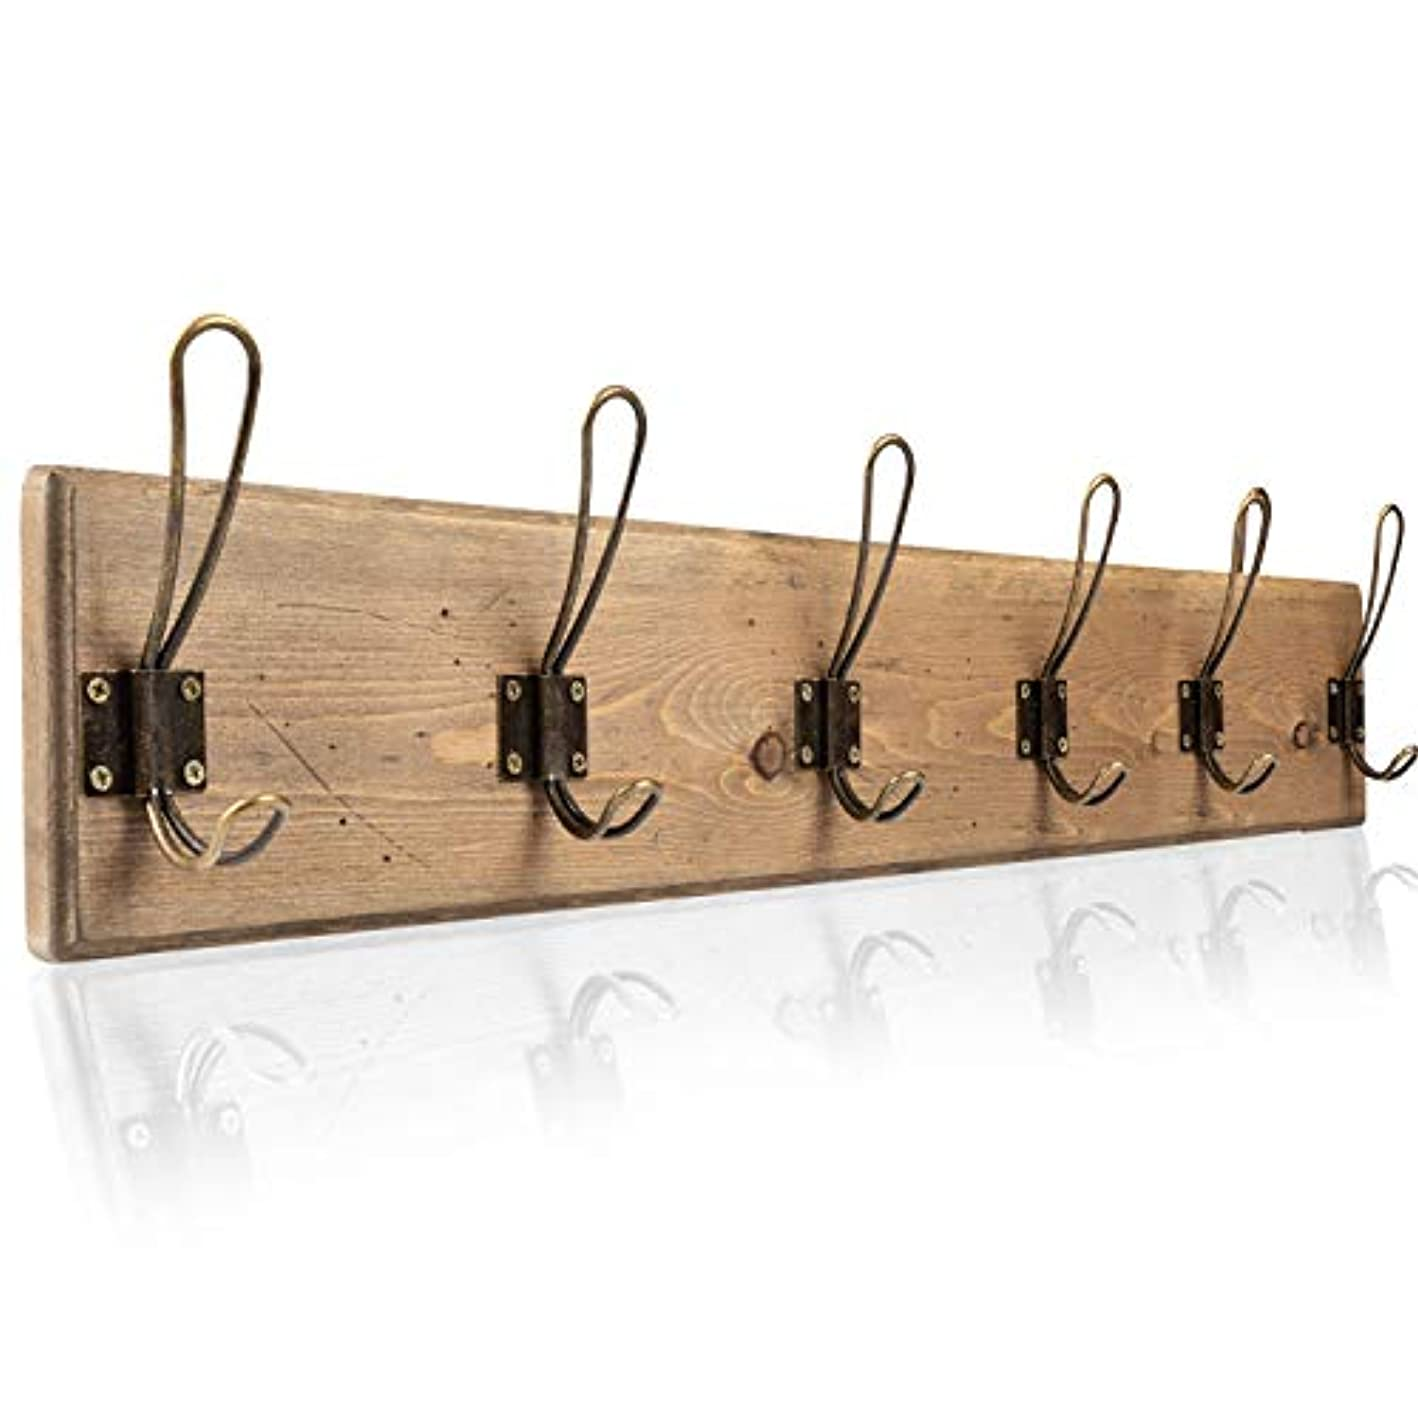 Wall Mounted Coat Rack - Rustic Wooden 6 Hook Coat Hanger Rail, Distressed Wood, Antique Brass Hooks